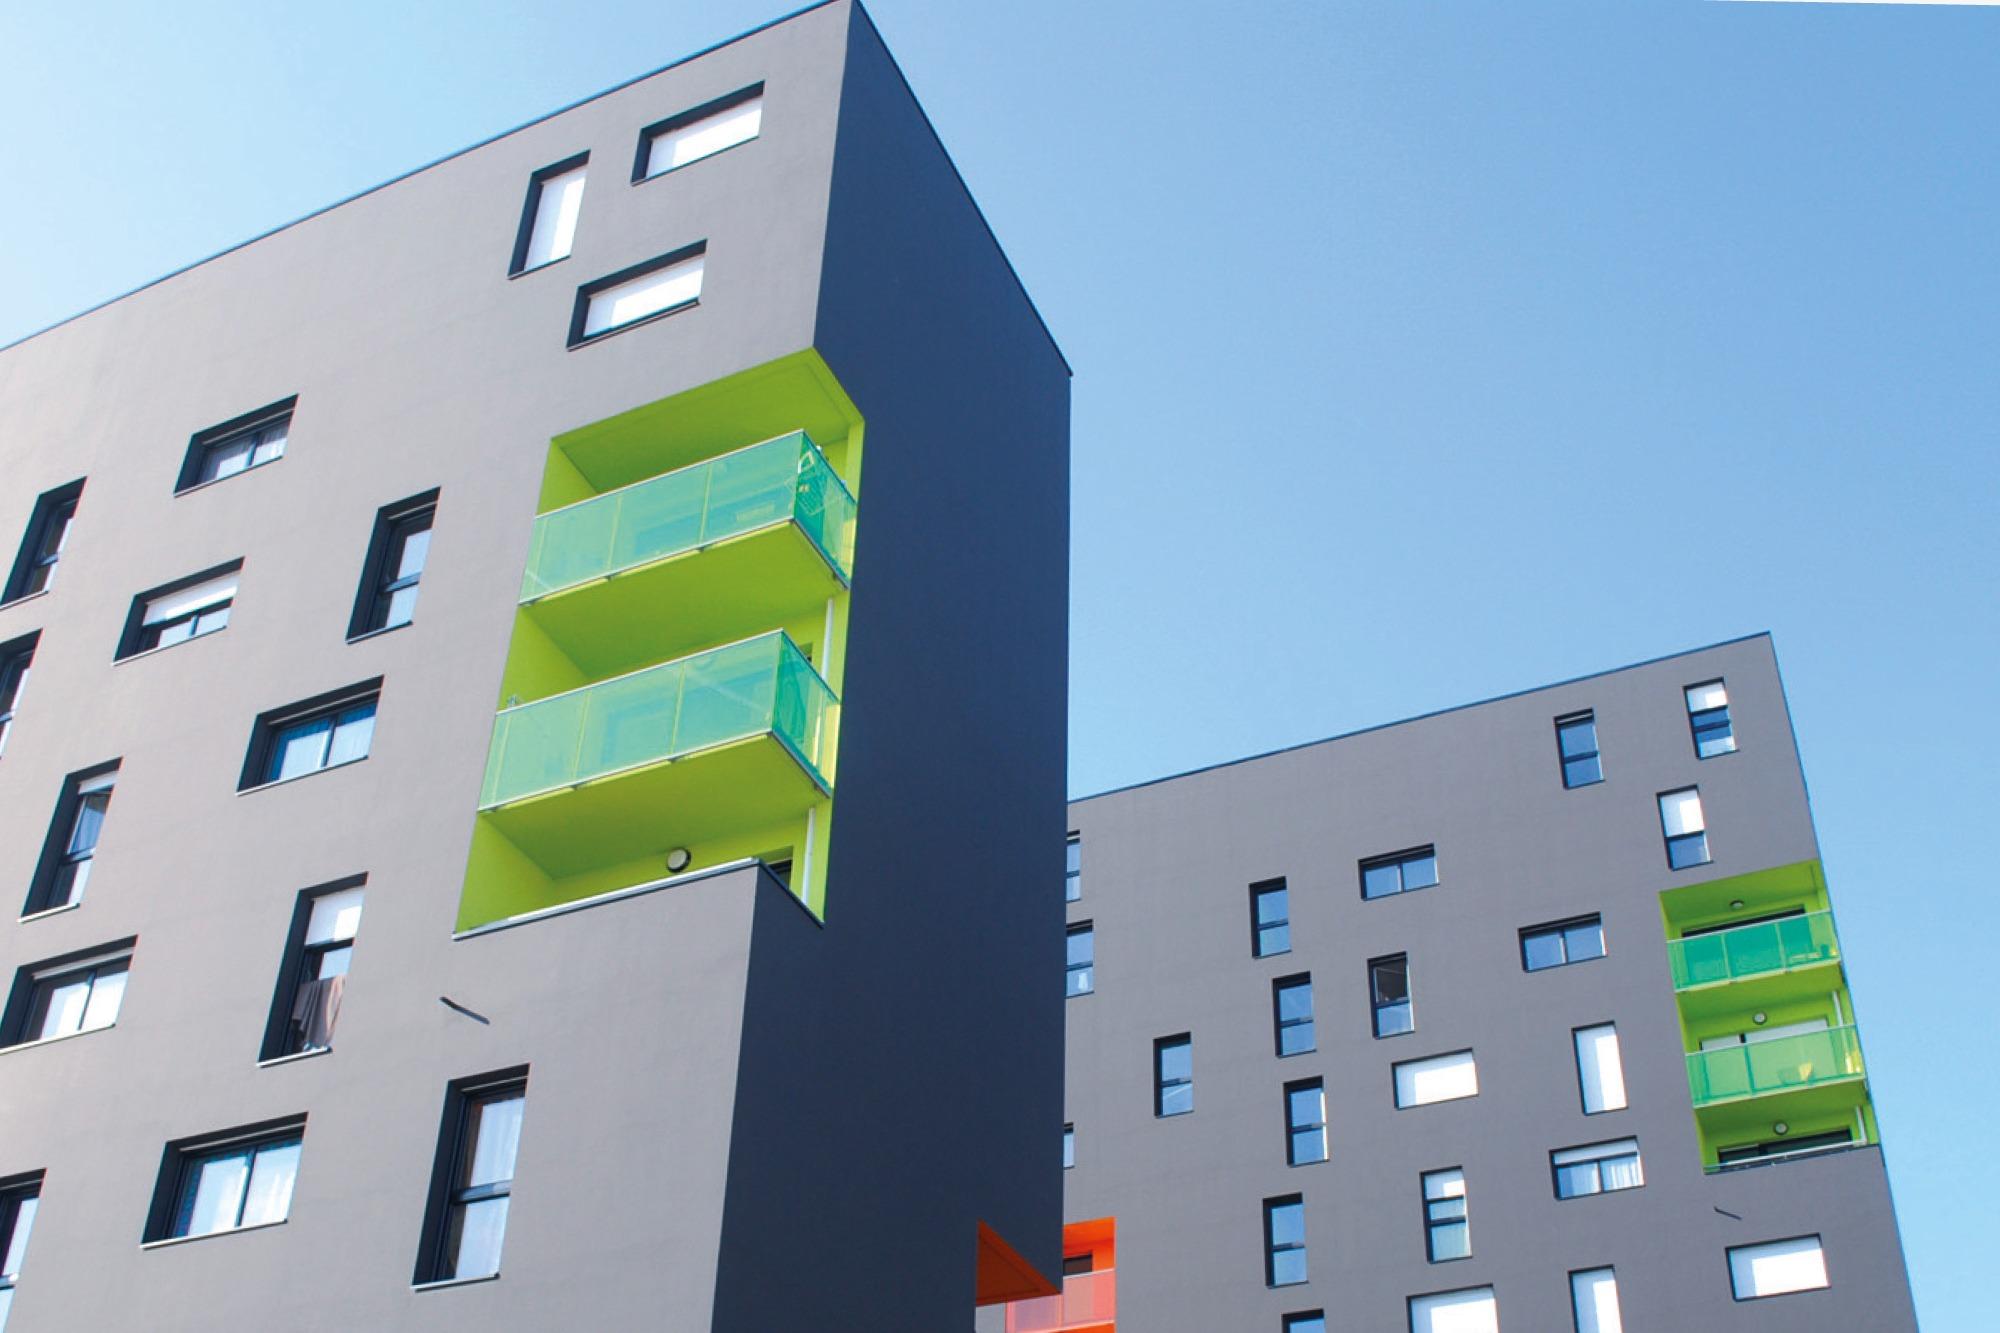 Studio dos, Grafikdesign Osnabrück, Keimfarben Farbtongarantie Fassade